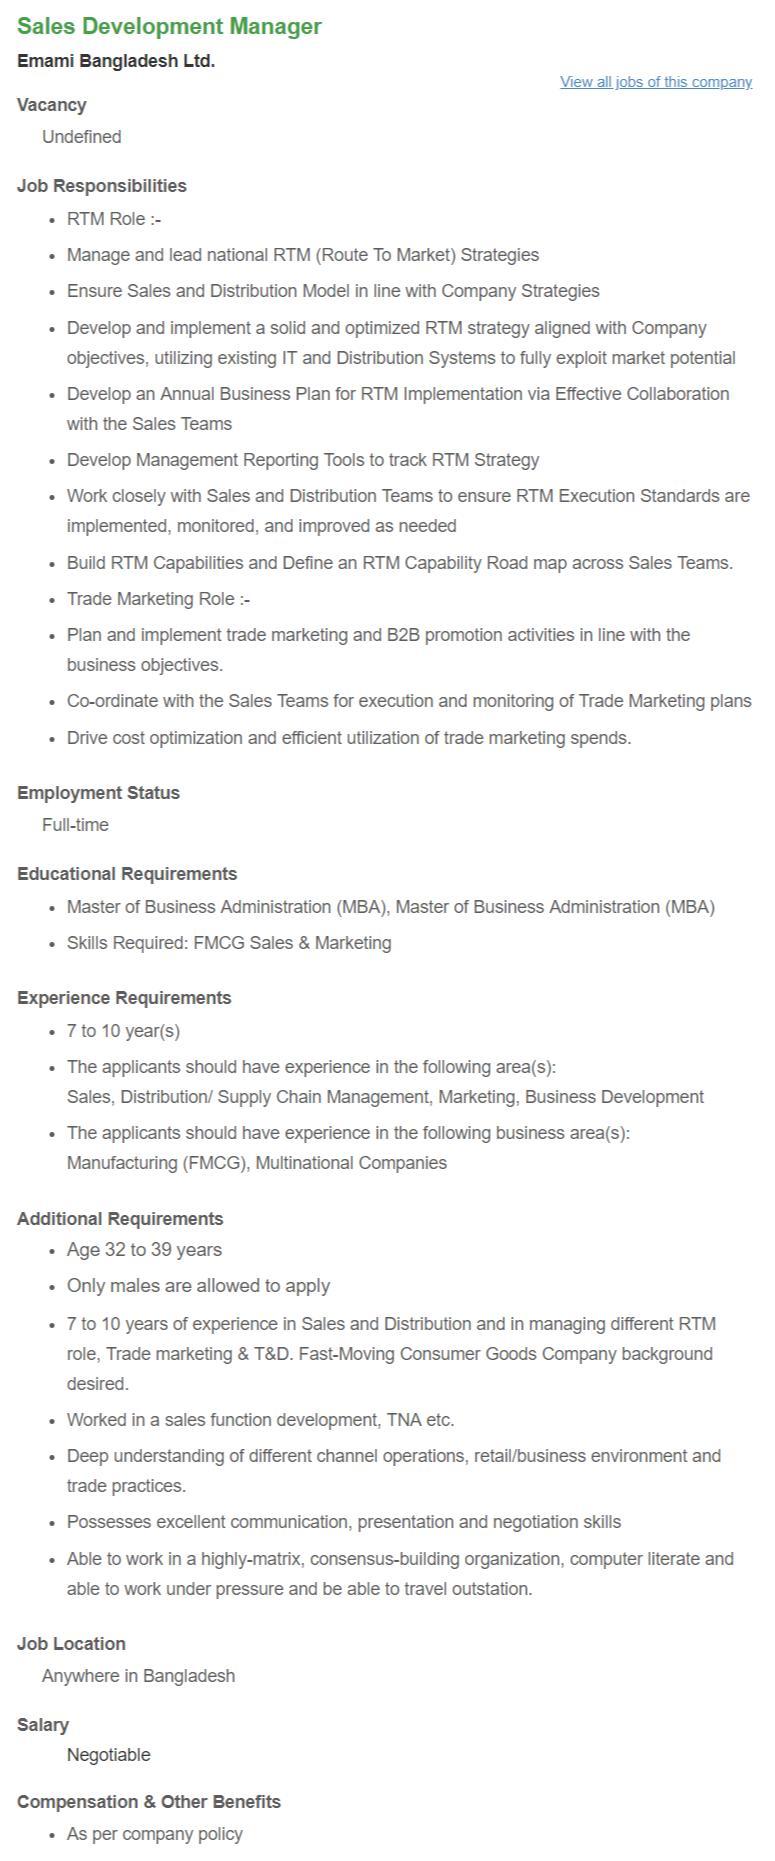 Emami Bangladesh Ltd Job Circular